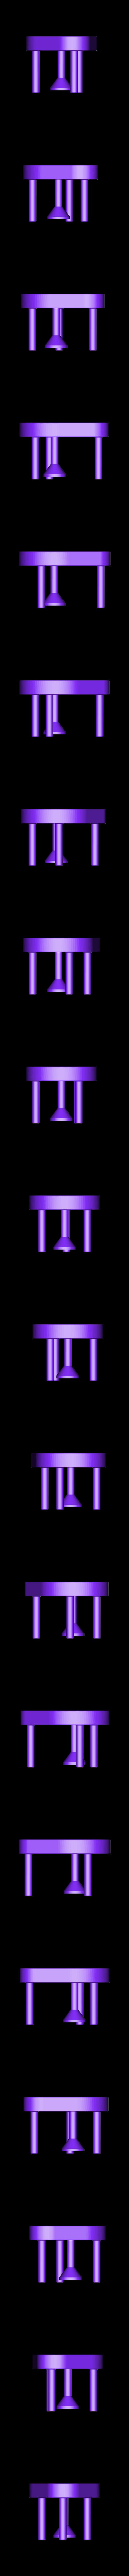 Pottery_Wheel.stl Download free STL file Pottery Wheel & Kiln Toy Set • 3D printing template, 3DBROOKLYN